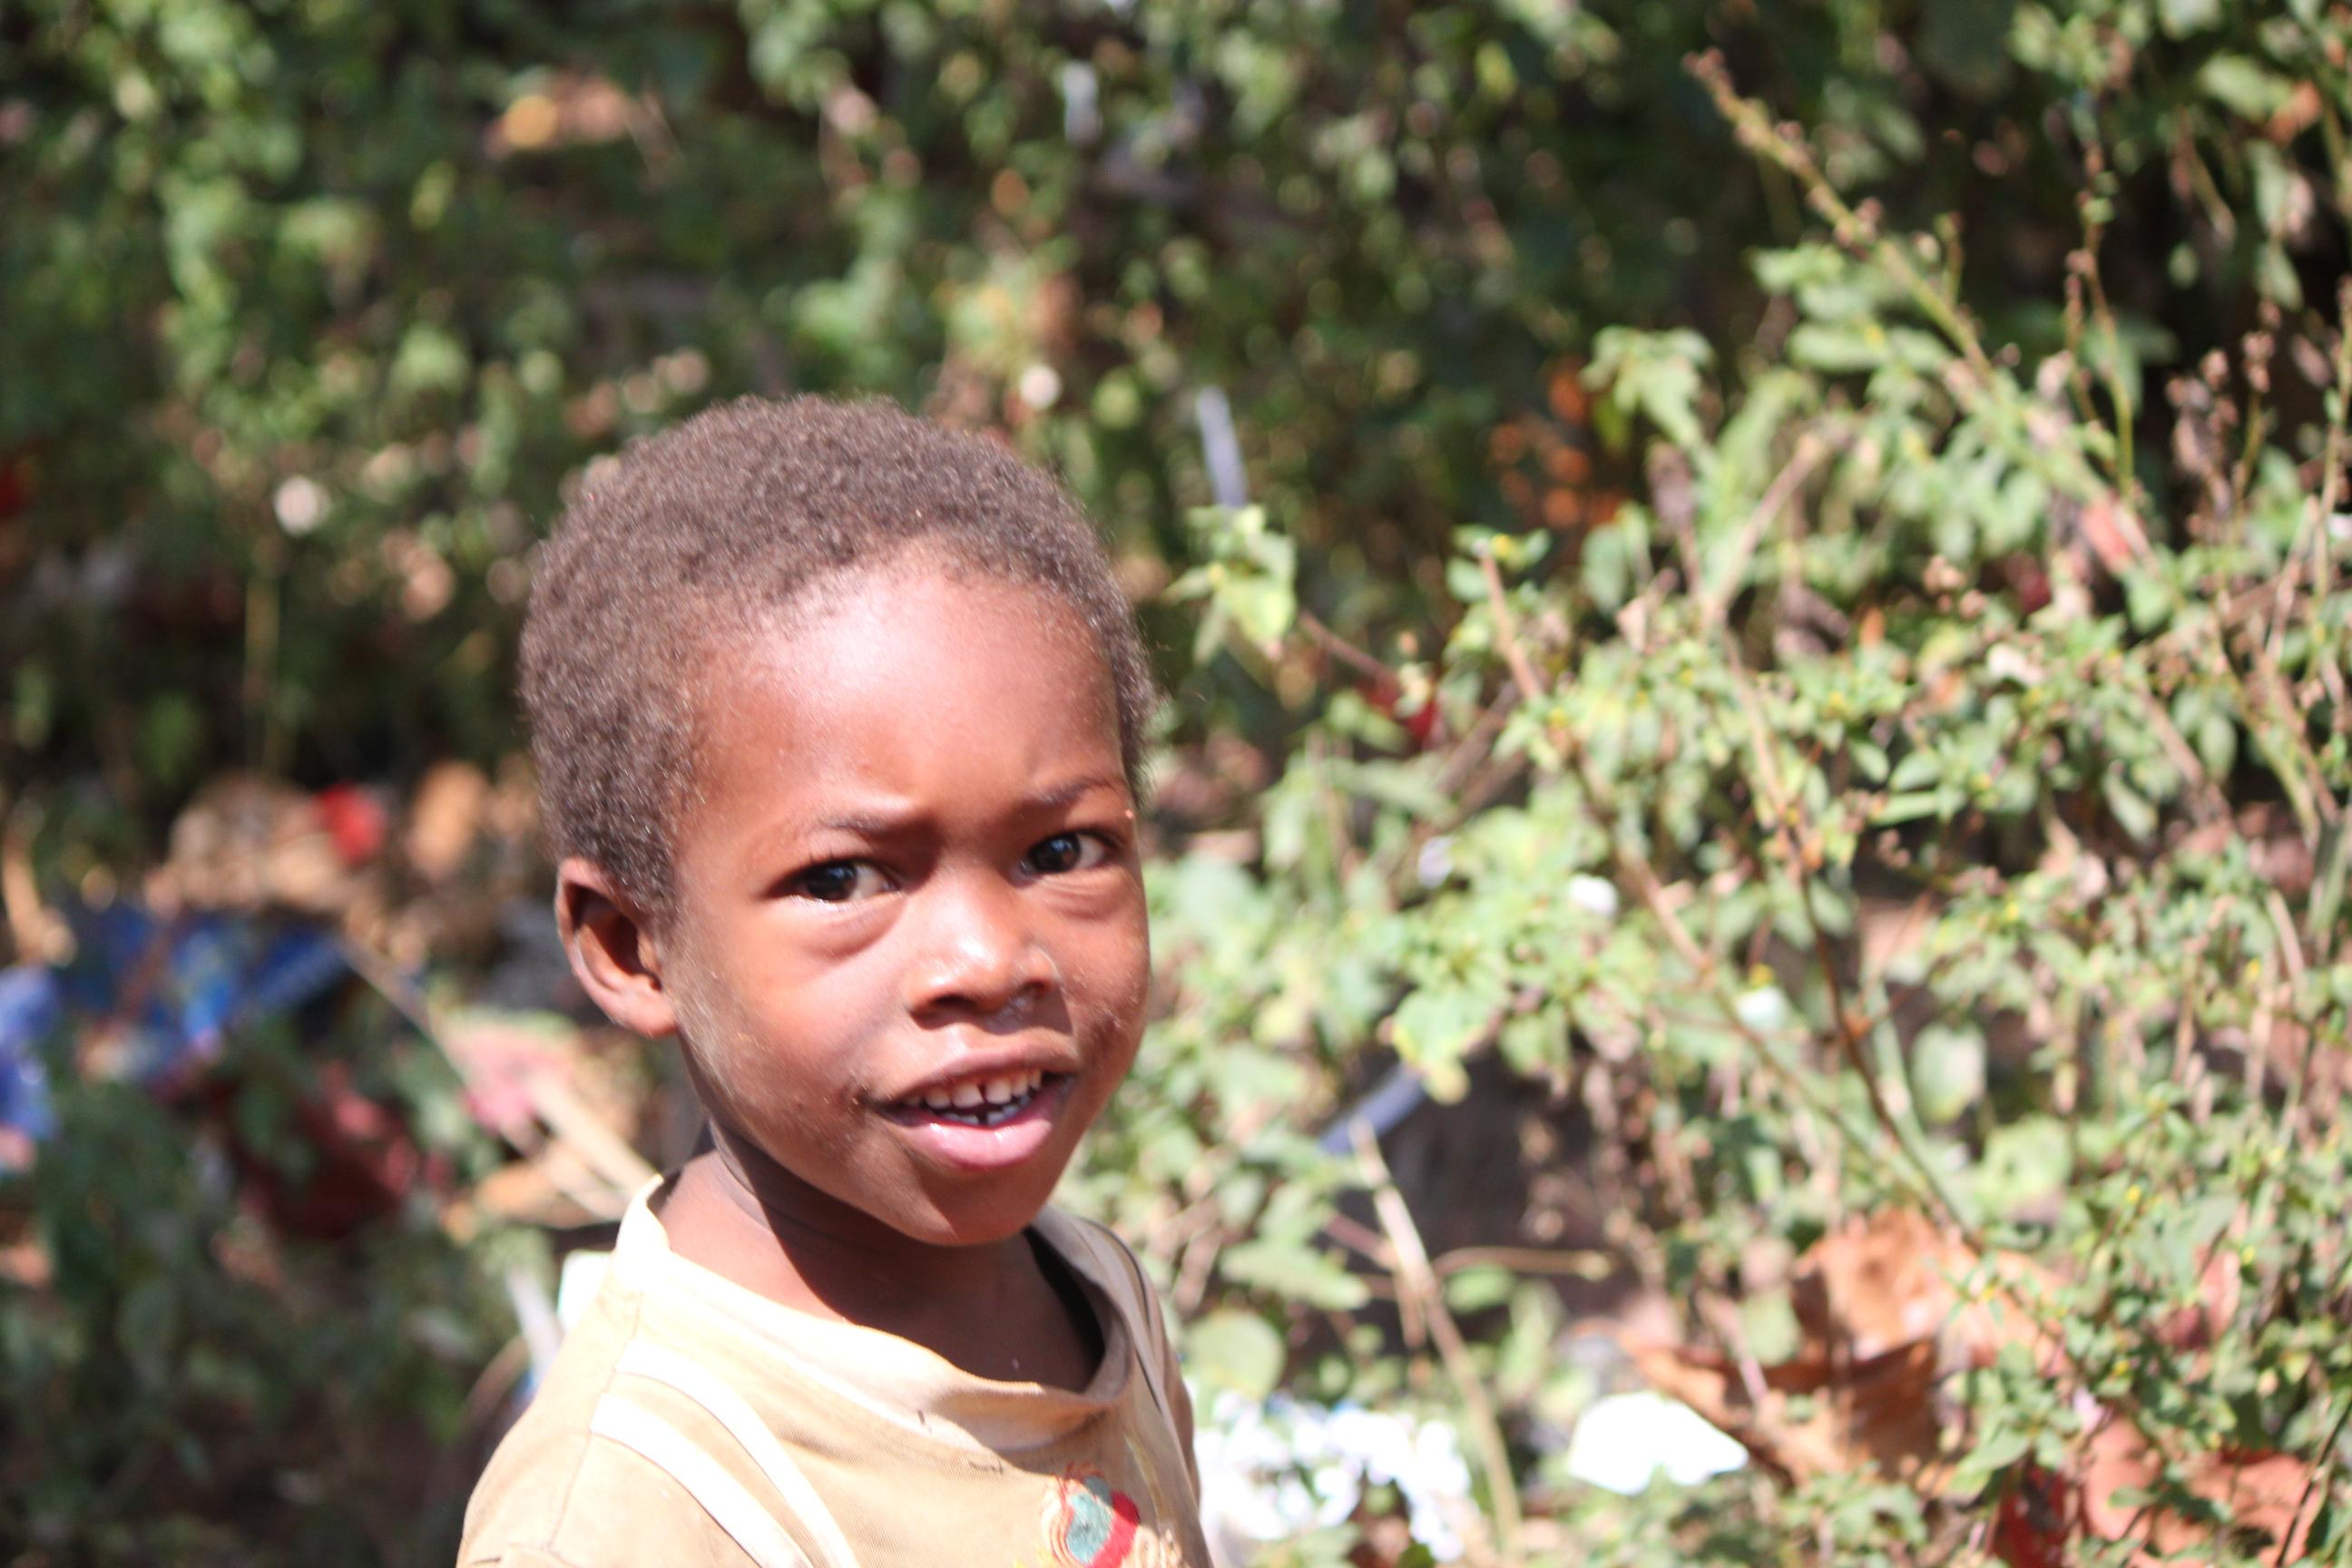 Awesome Little Guy; Stone Town, Zanzibar, Tanzania; 2011